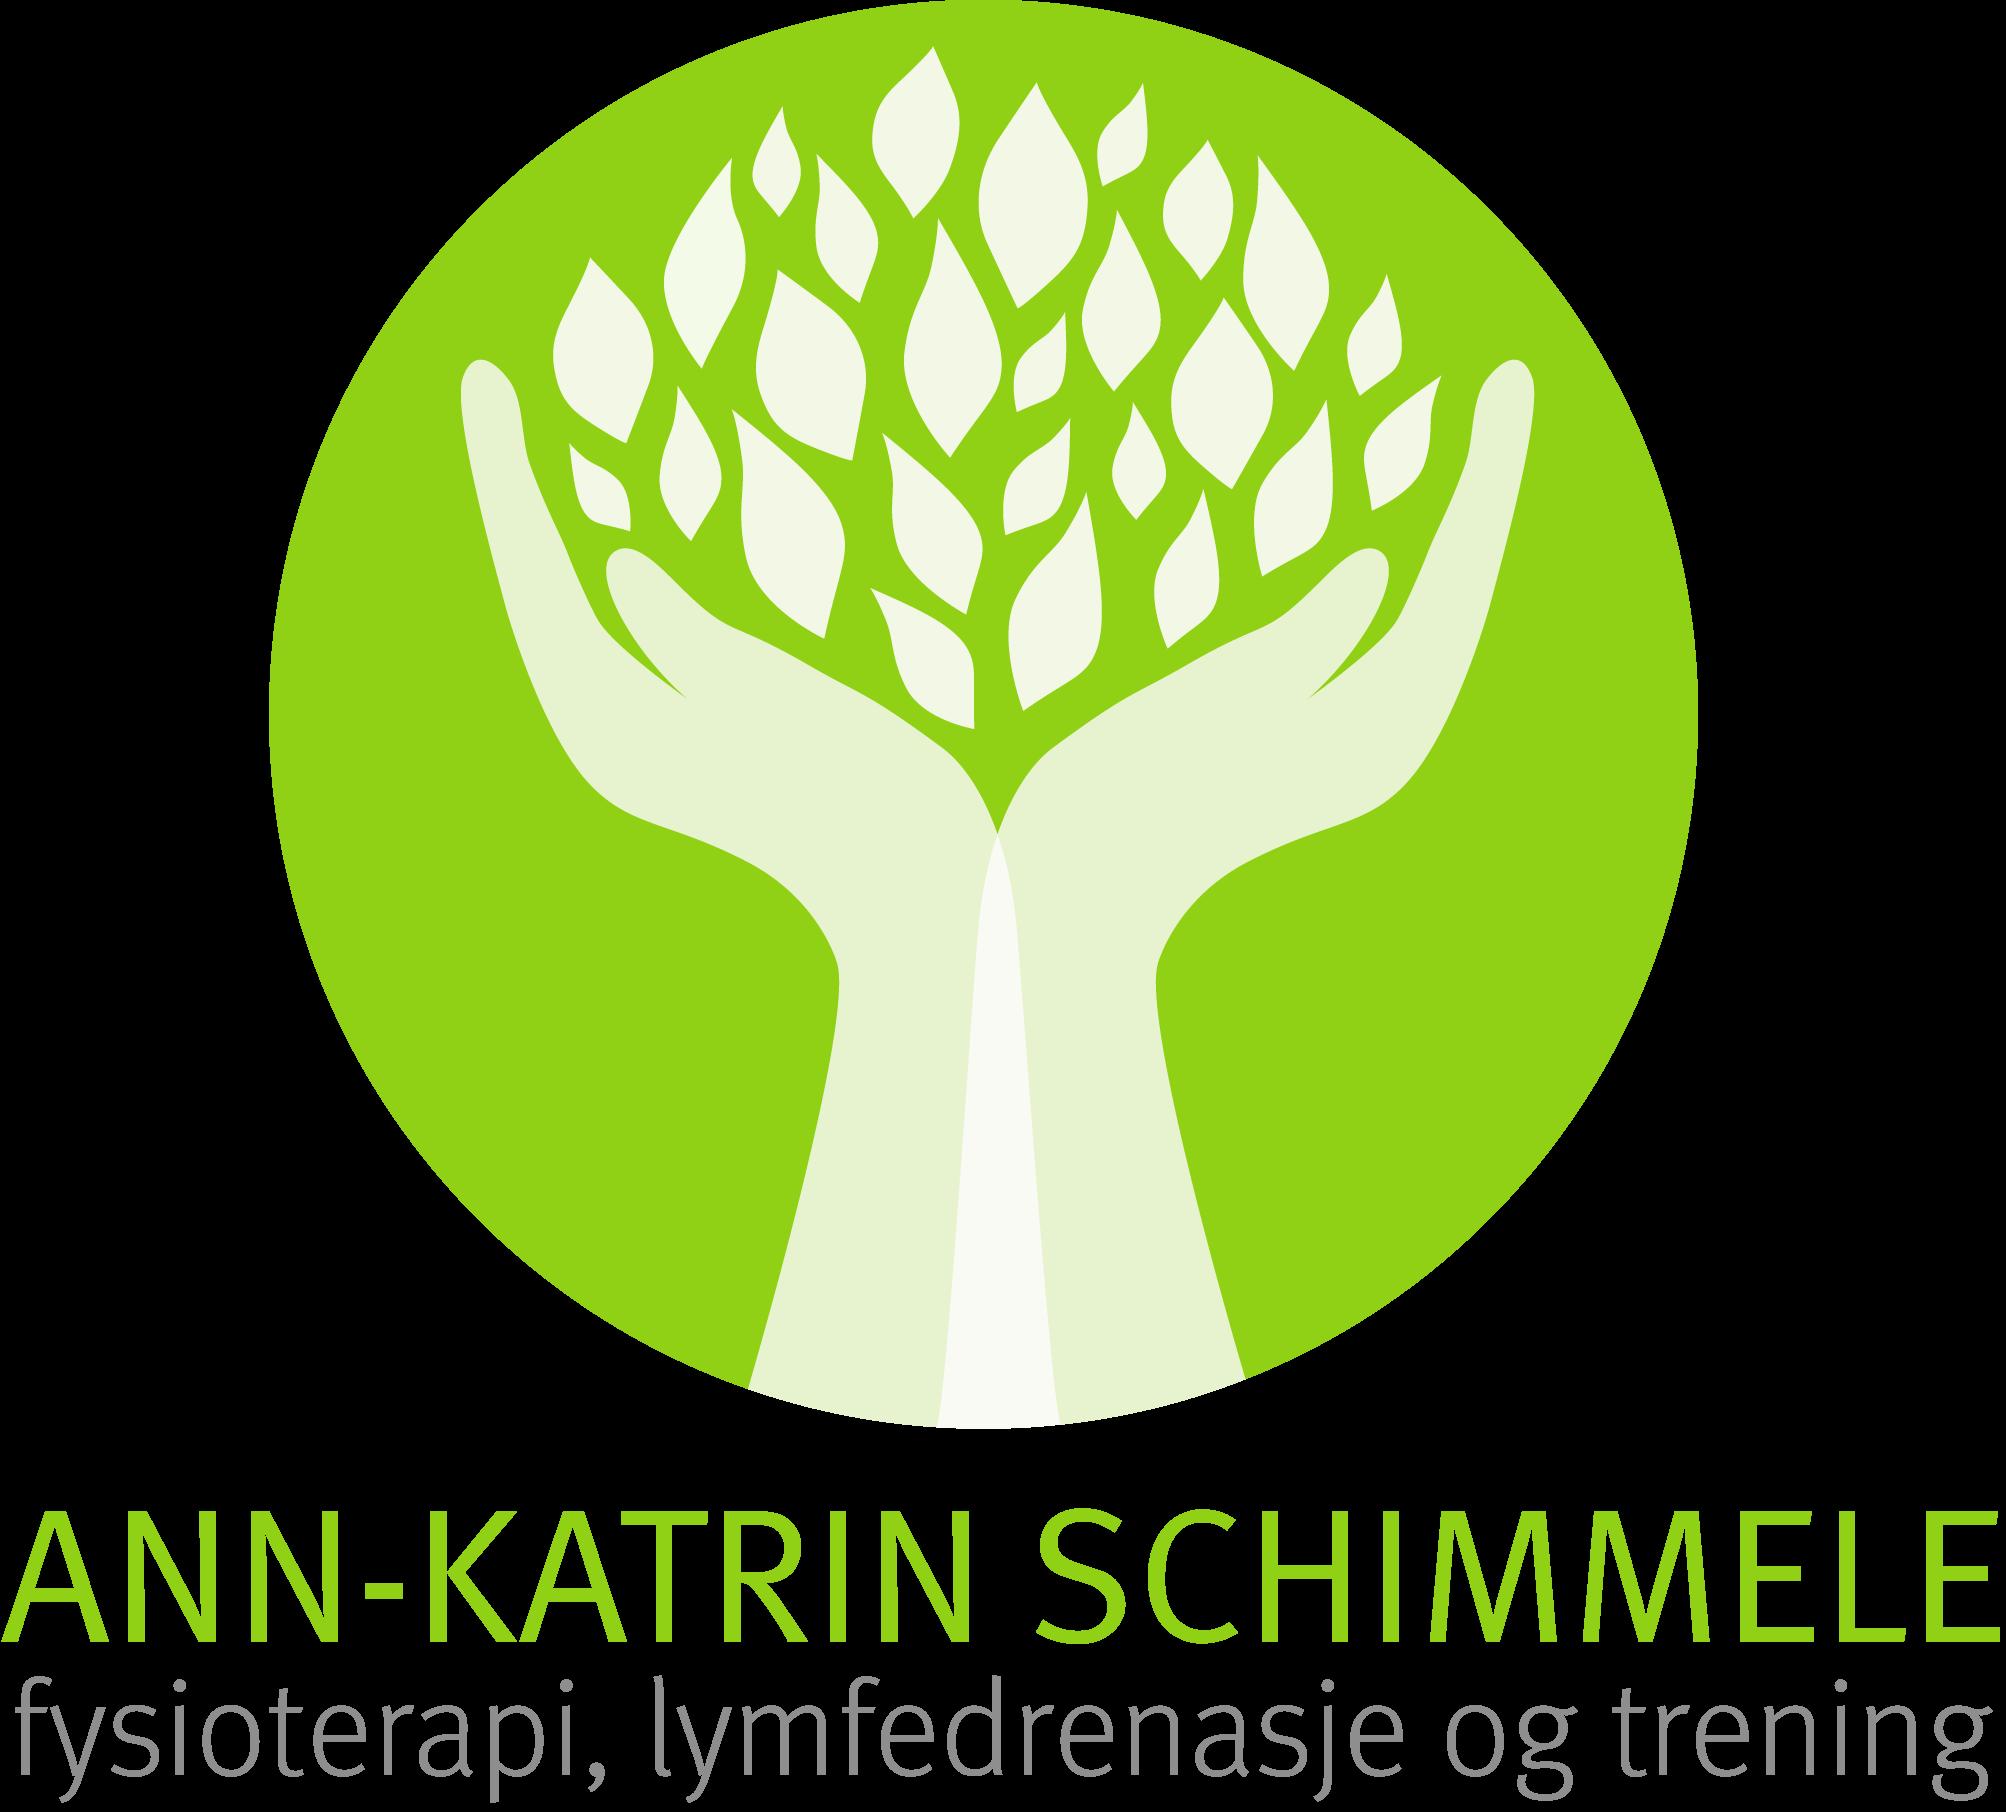 Ann-Katrin Schimmele fysioterapi